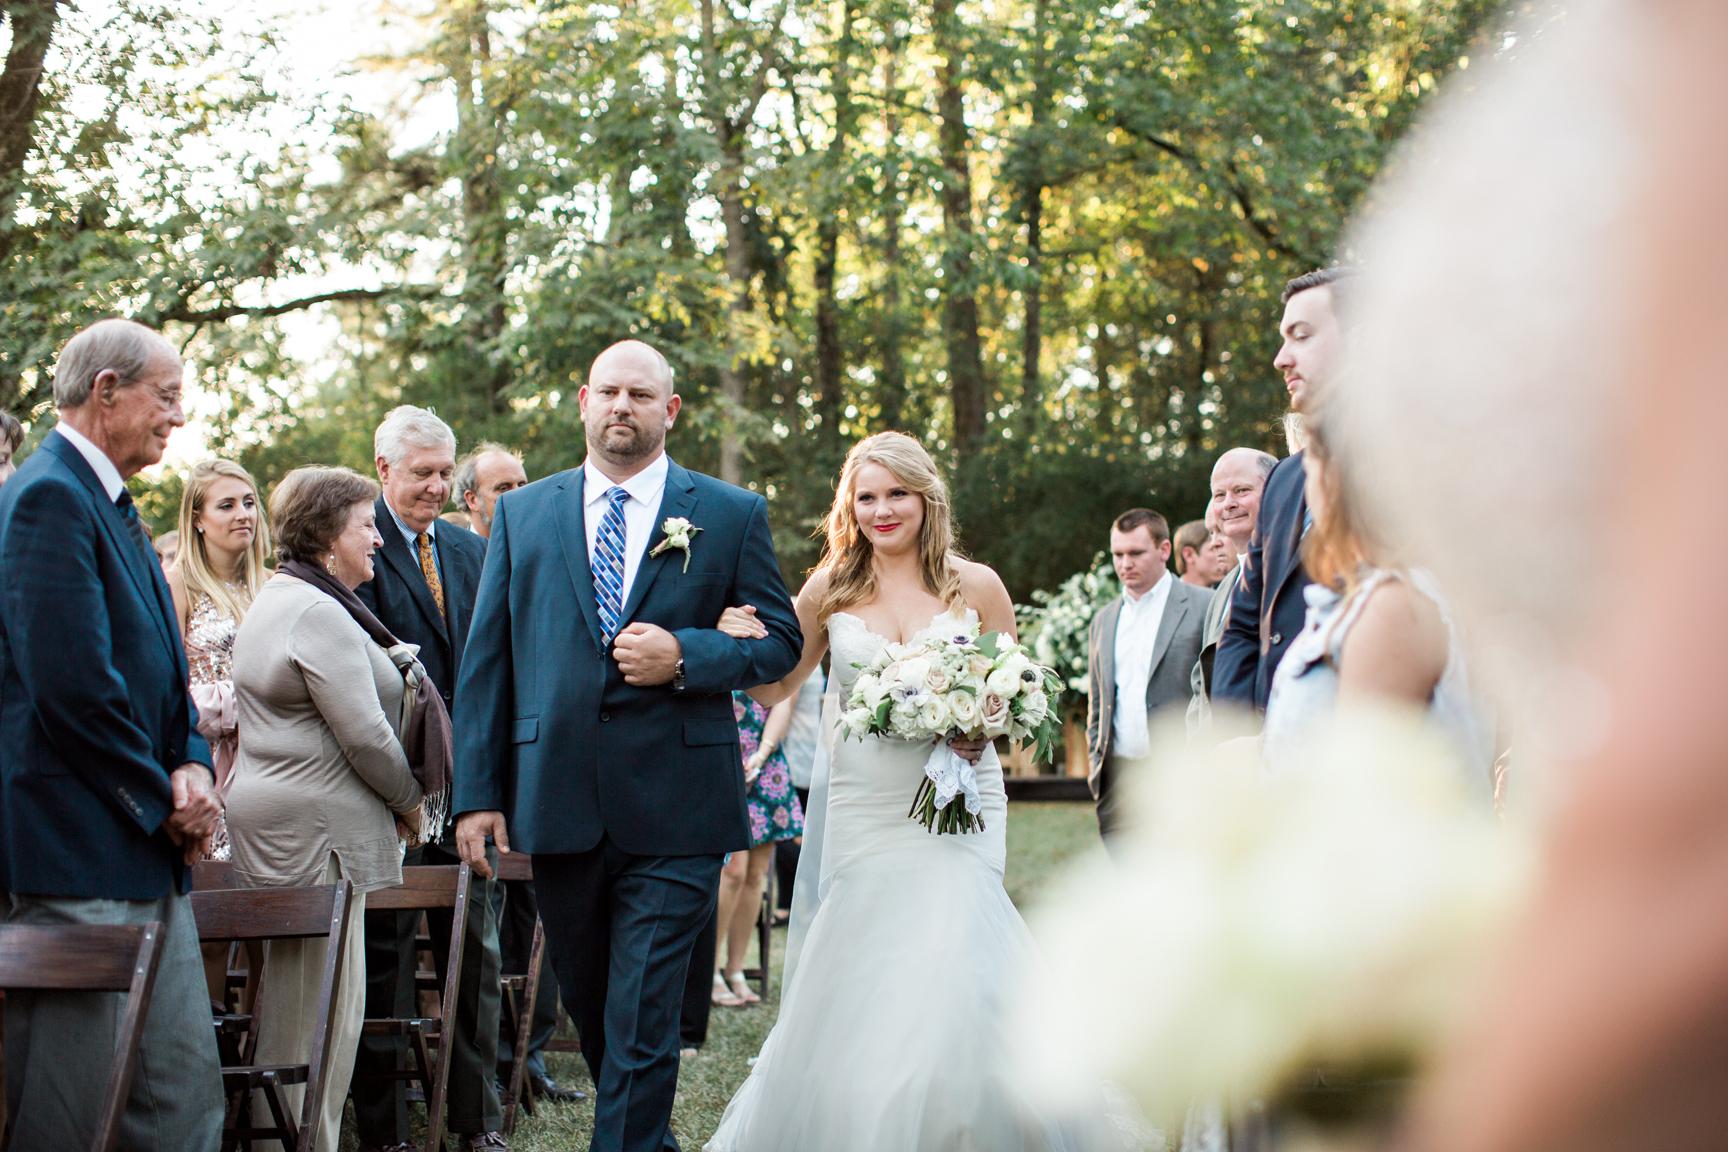 Alabama-Wedding-Photographers-Nick-Drollette-147.jpg